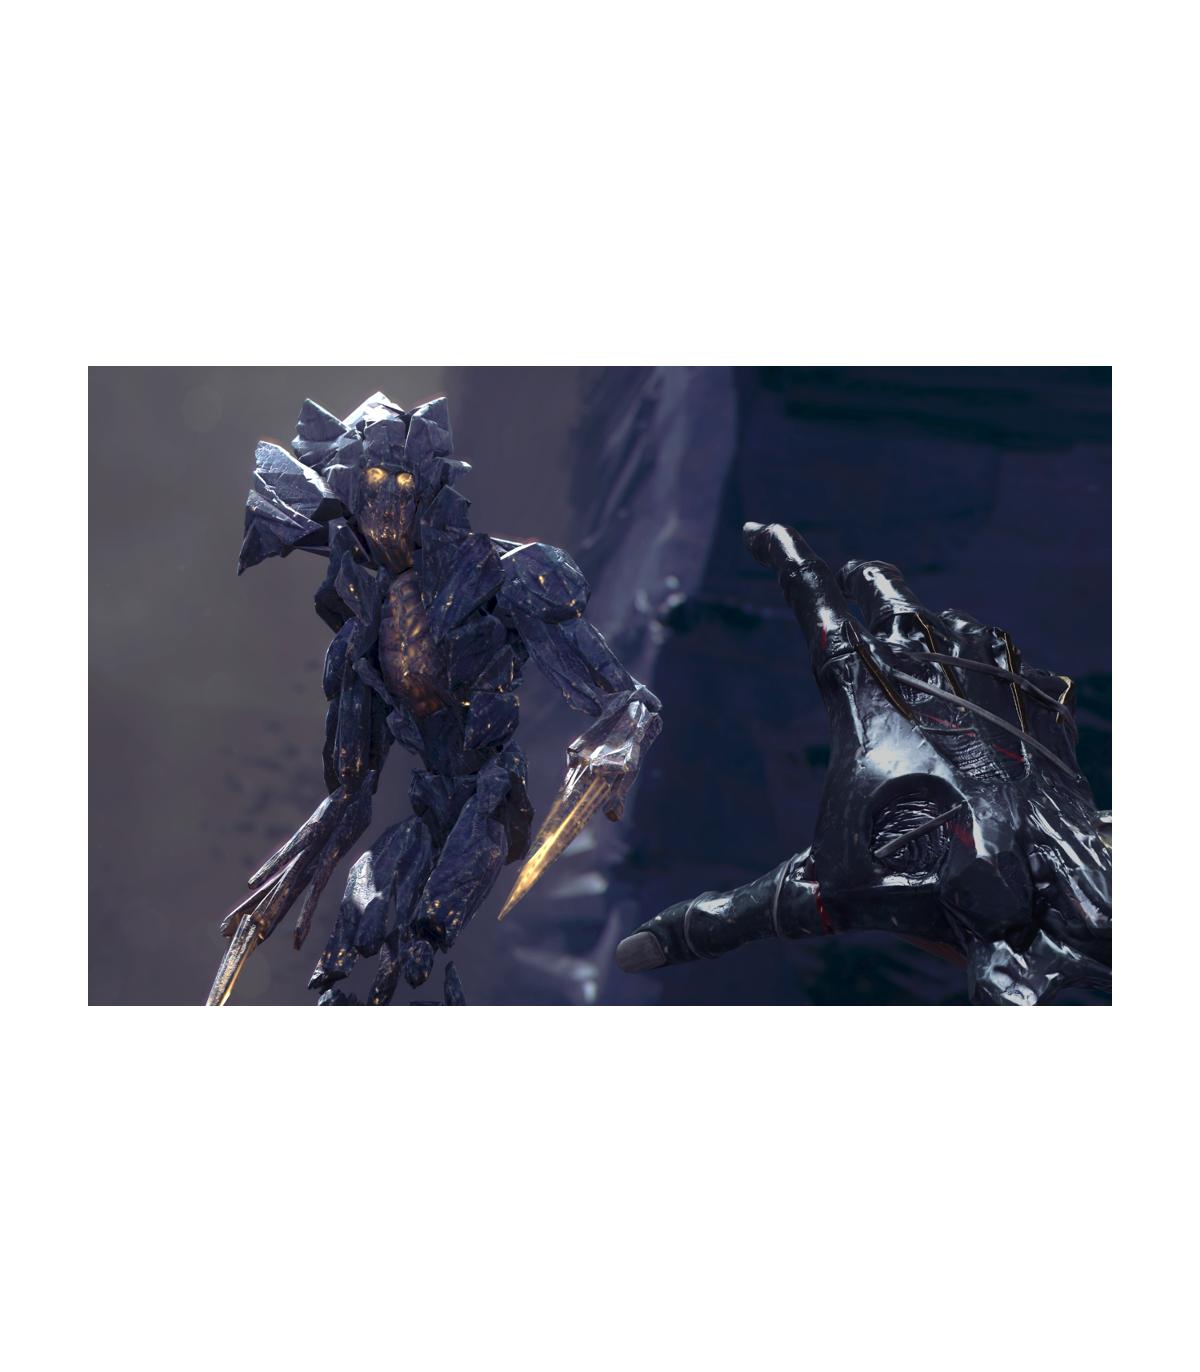 بازی Dishonored:Death of the outsider -پلی استیشن ۴